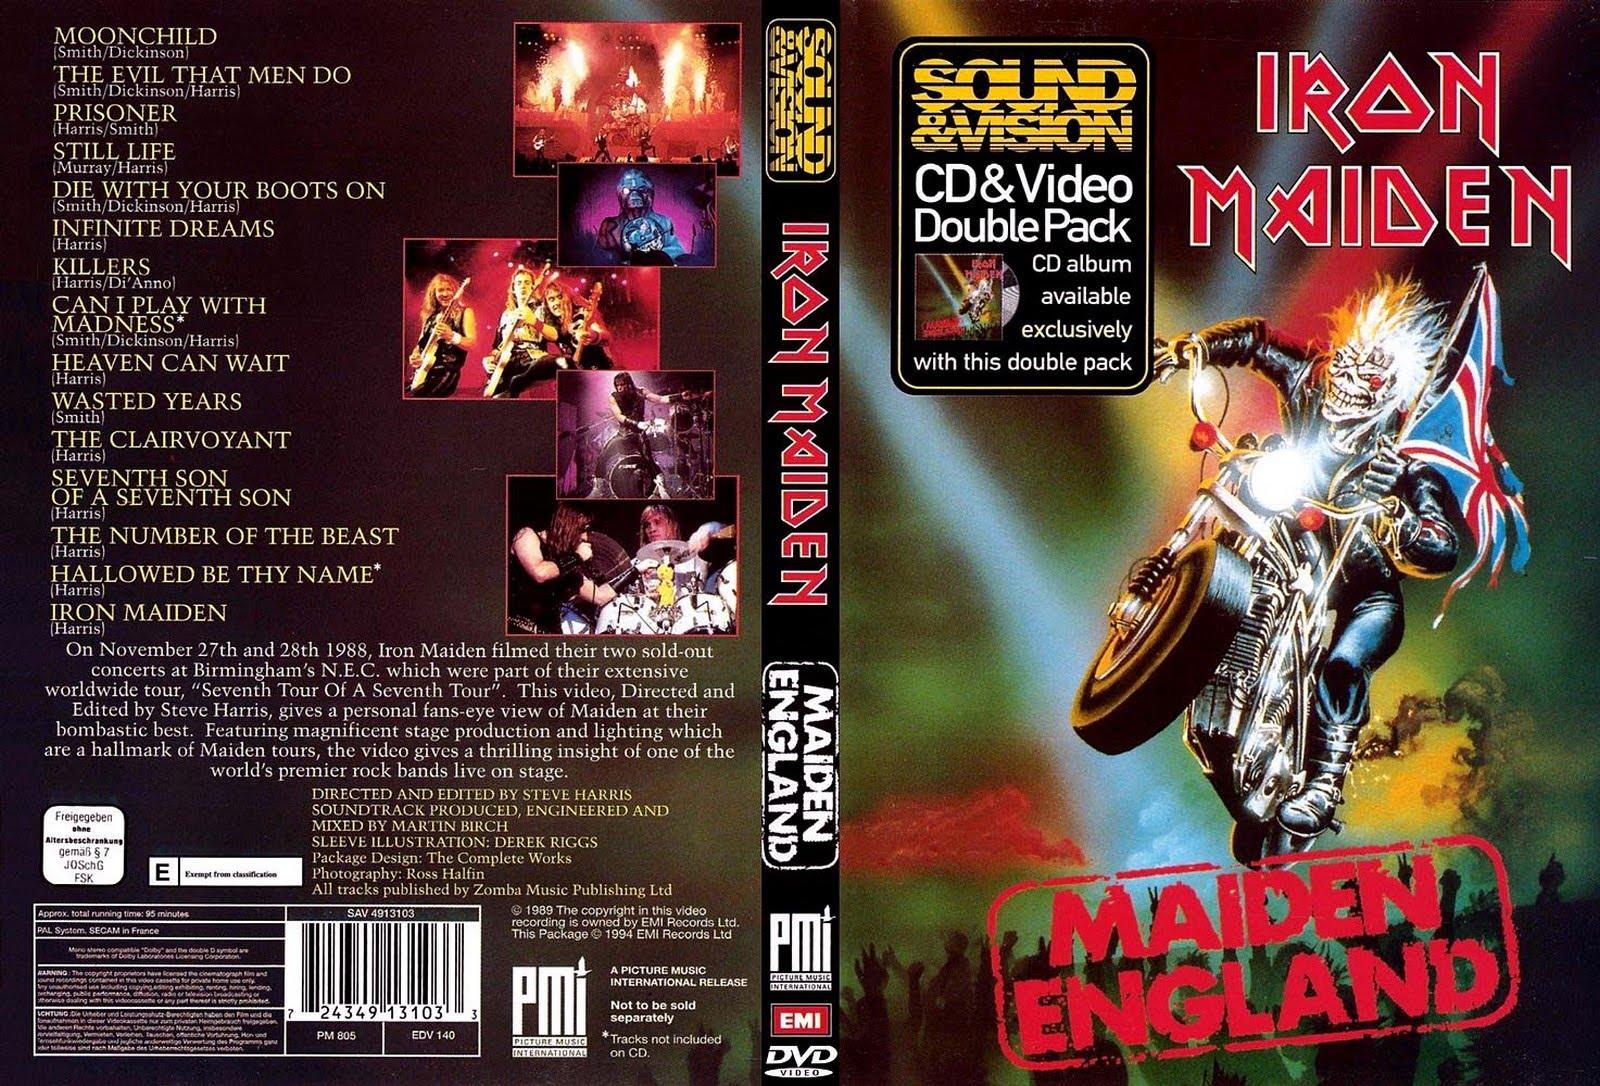 http://4.bp.blogspot.com/_brcl7Spzbn4/S-mxWJ-wAOI/AAAAAAAAAKs/aROxtjJTJ1E/s1600/Iron-Maiden-Maiden-England.jpg